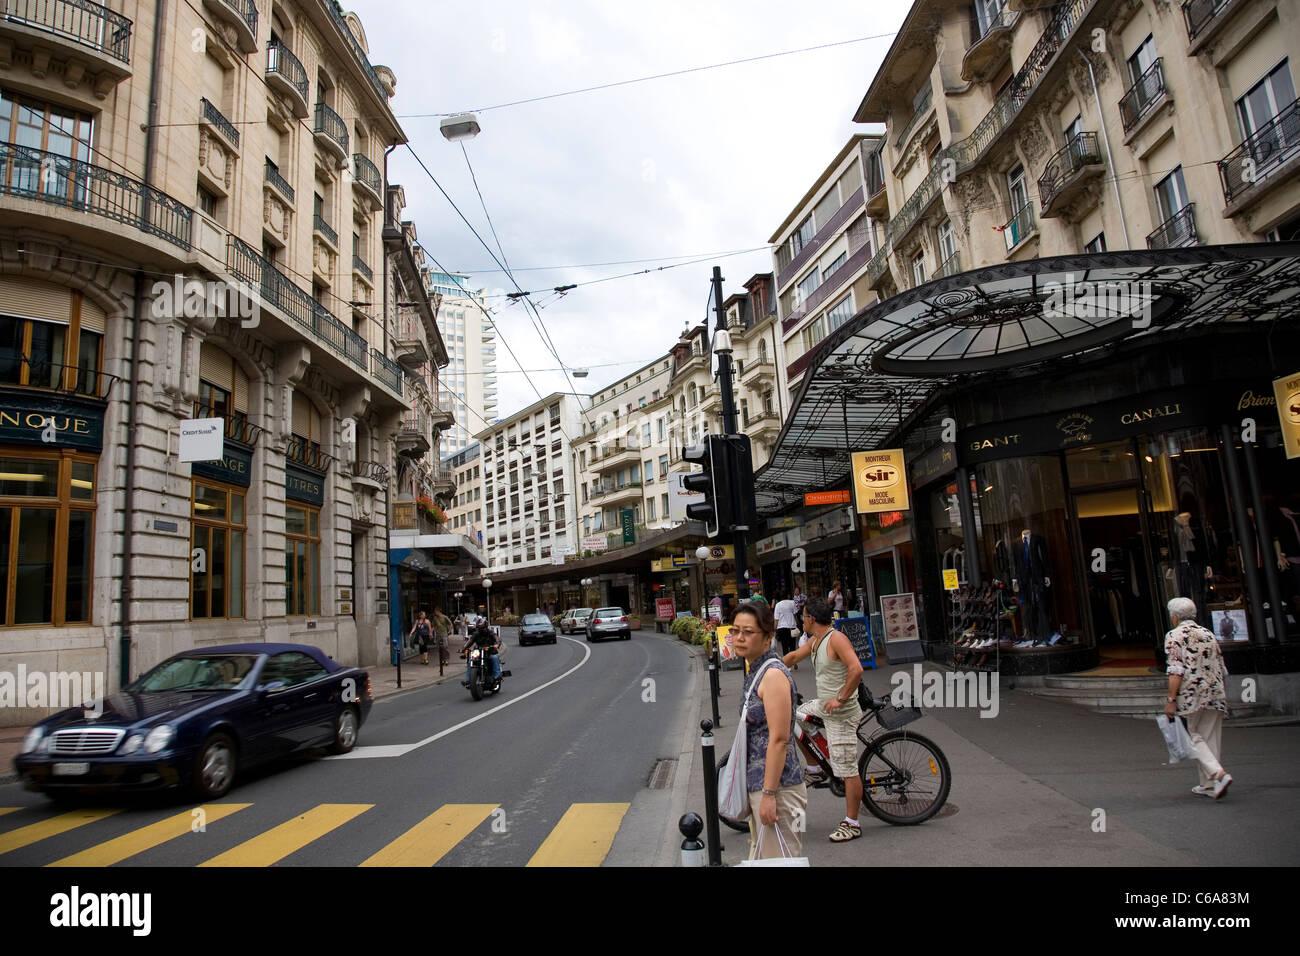 Avenue du Casino in Montreux - Stock Image